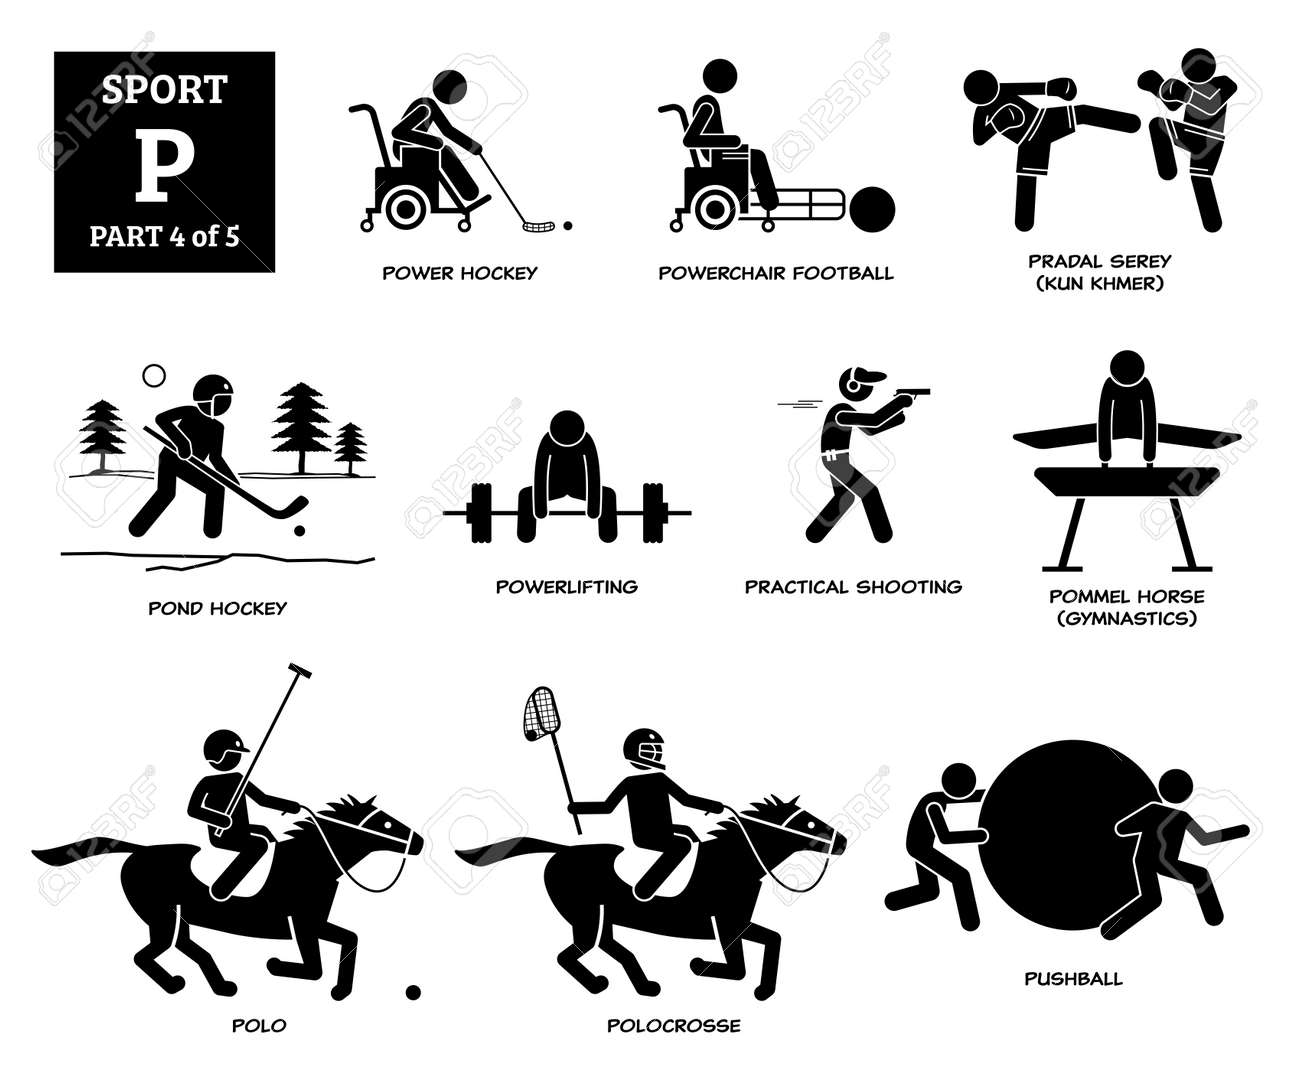 Sport games alphabet P vector icons pictogram. Power hockey, powerchair football, pradal serey, pond hockey, powerlifting, practical shooting, pommel horse, horse polo, polocrosse, and pushball. - 172034262